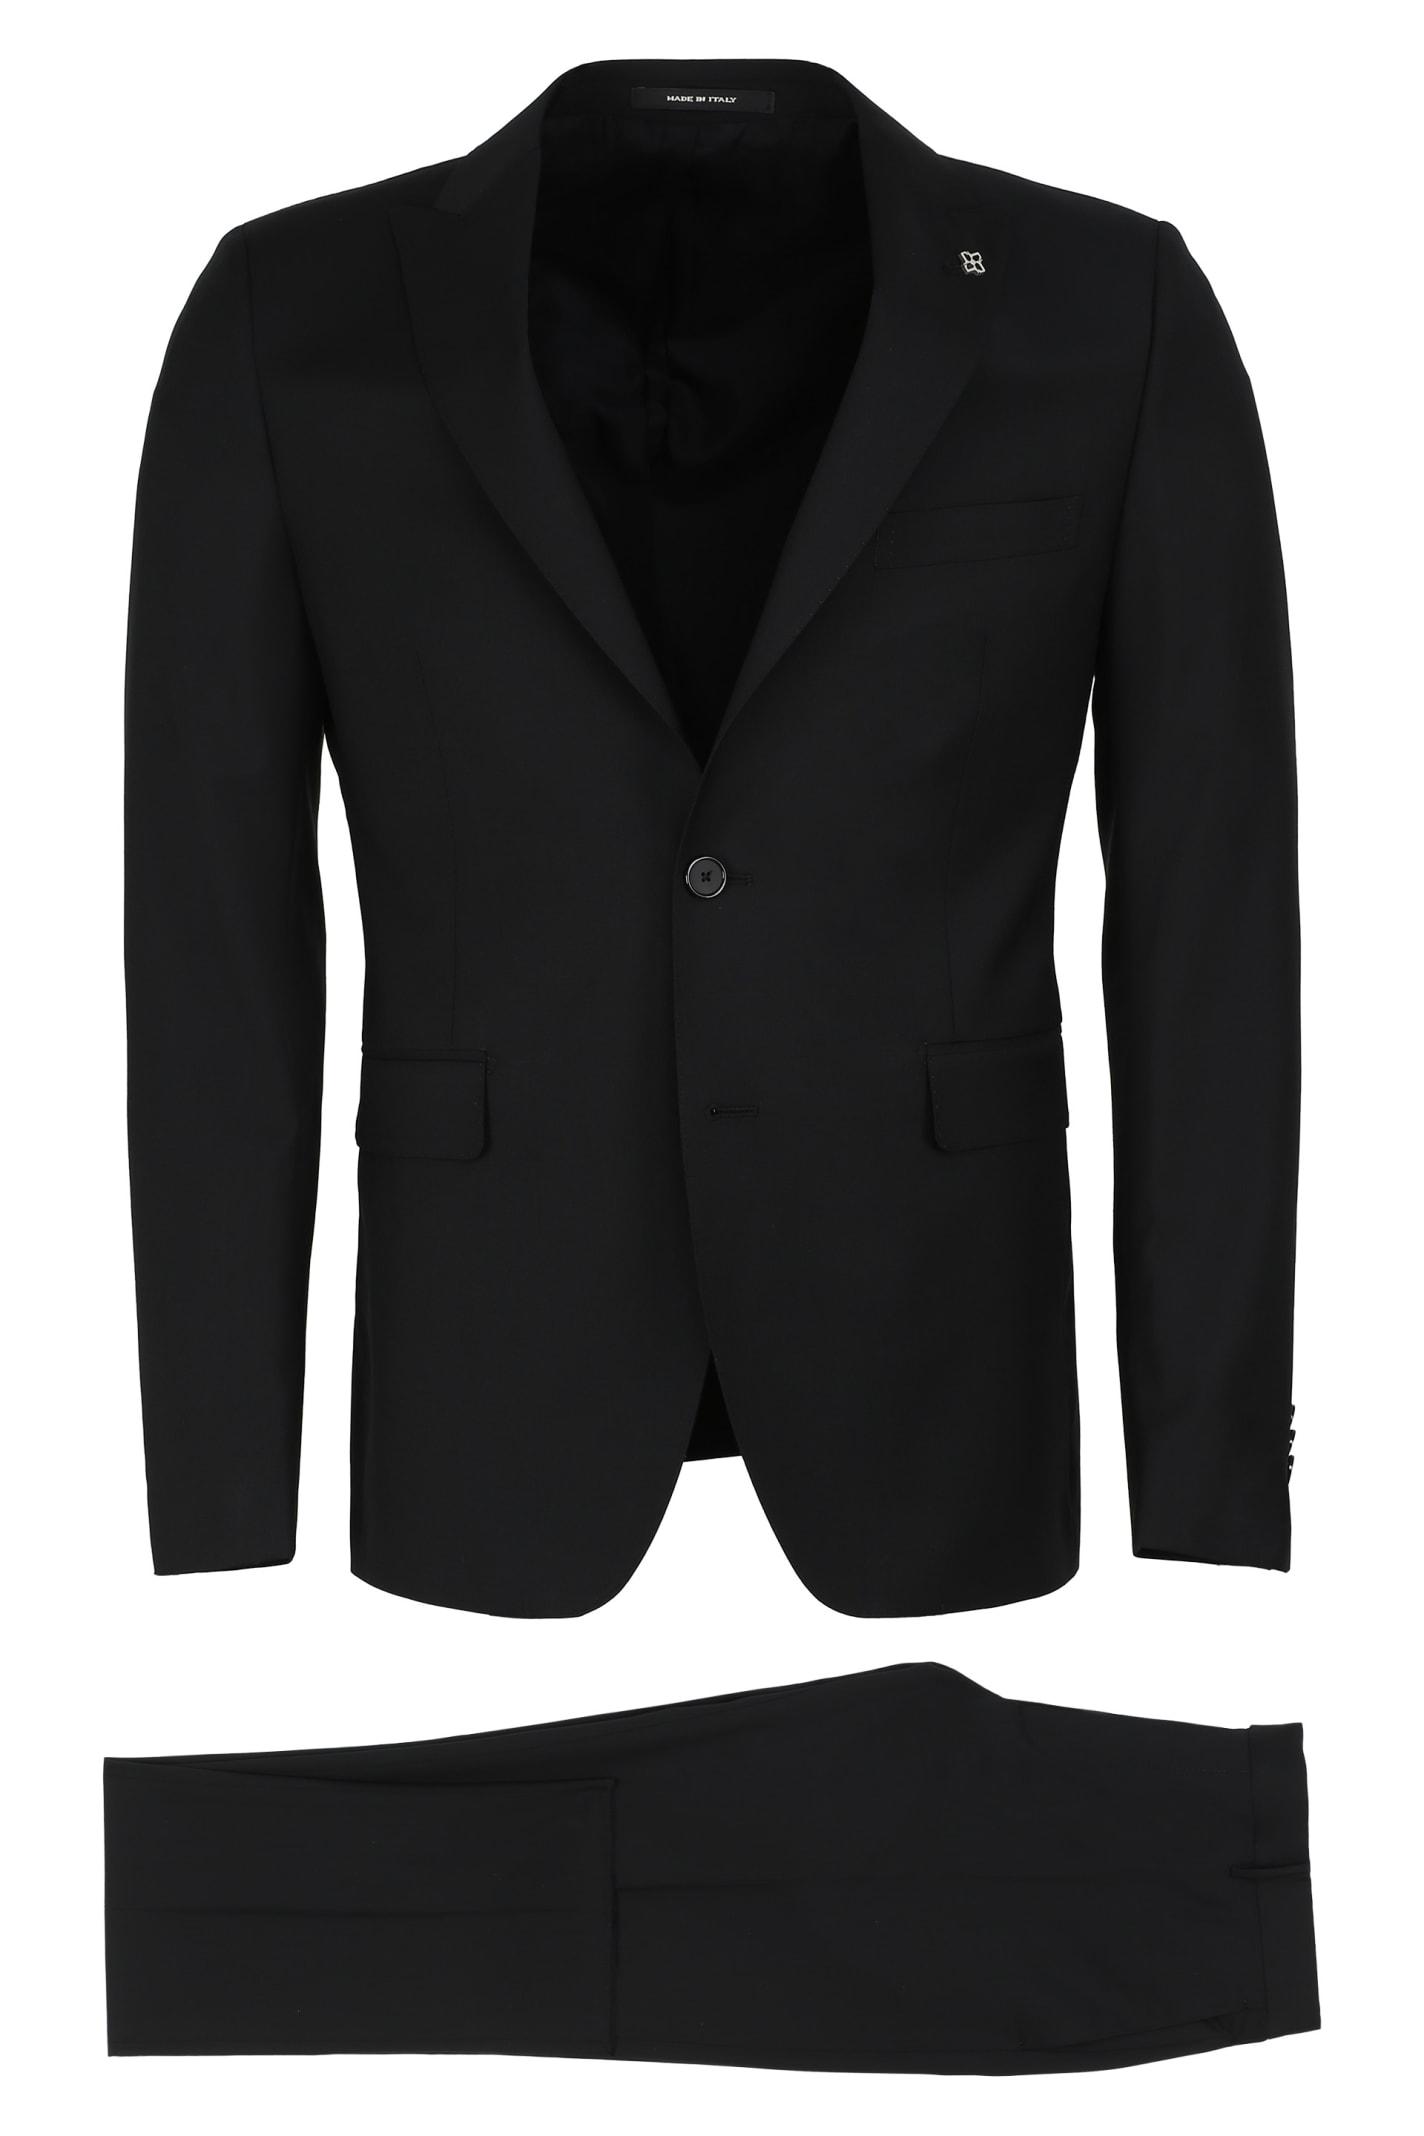 Tagliatore Virgin Wool Two Piece Suit